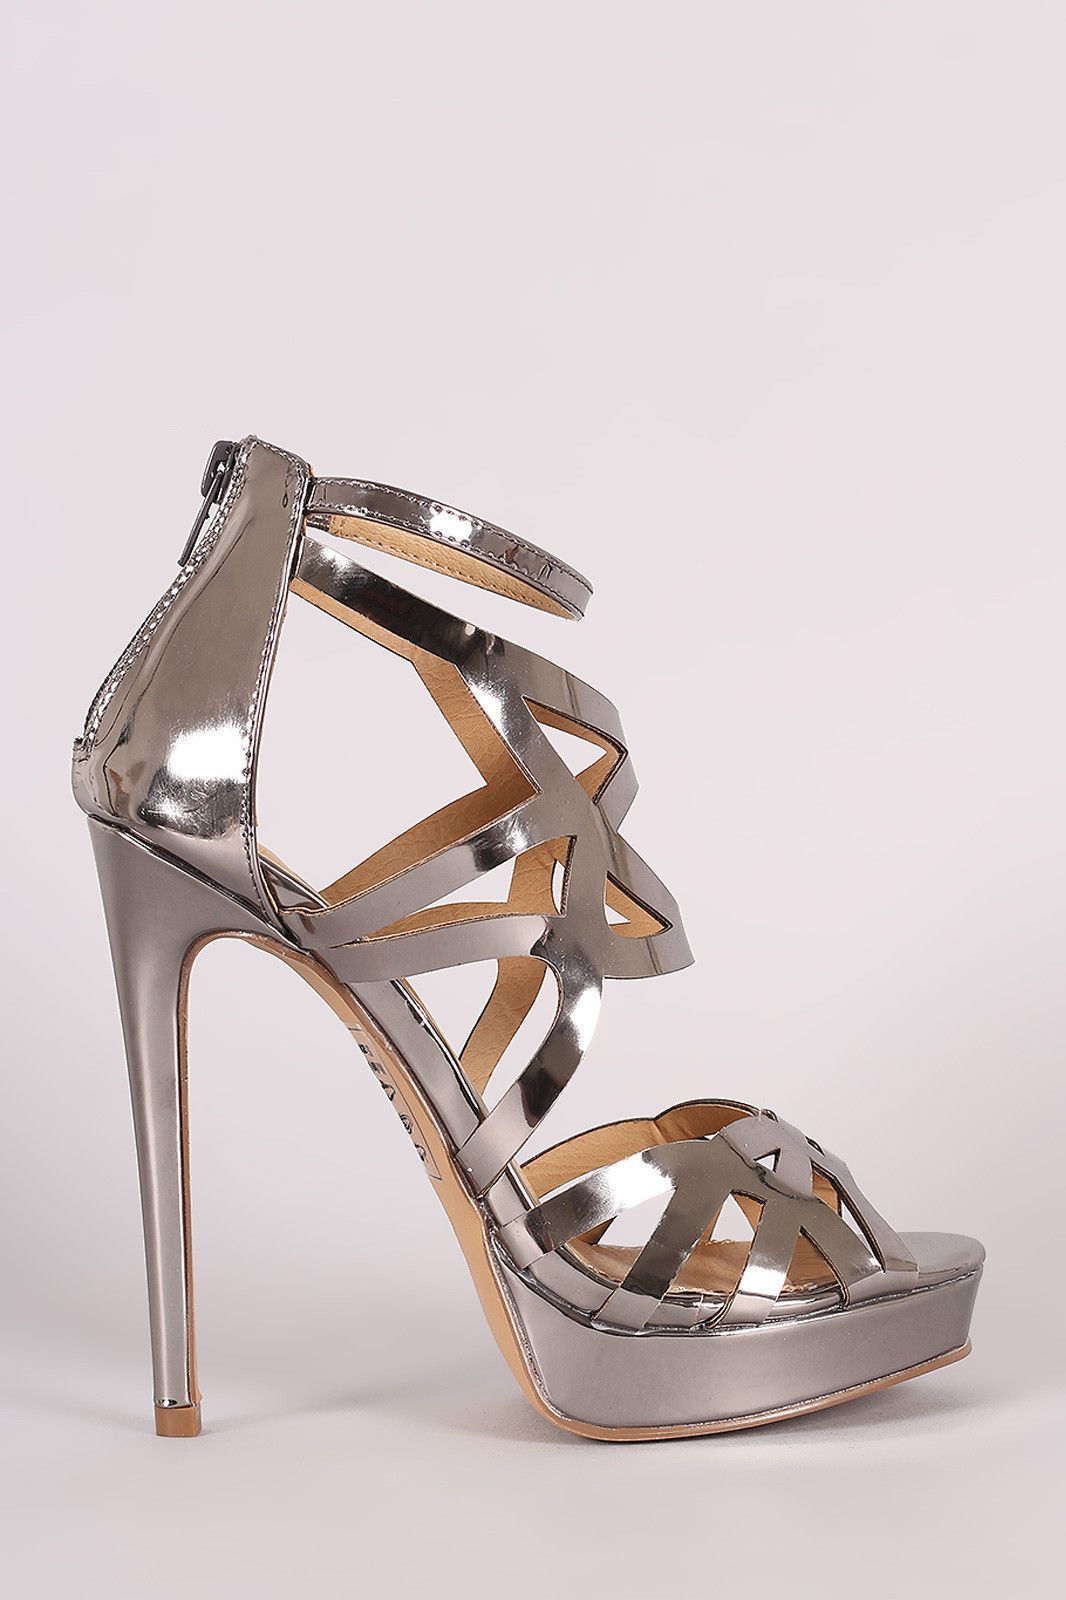 Shoe Republic LA Mirror Metallic Caged Stiletto Platform Heel